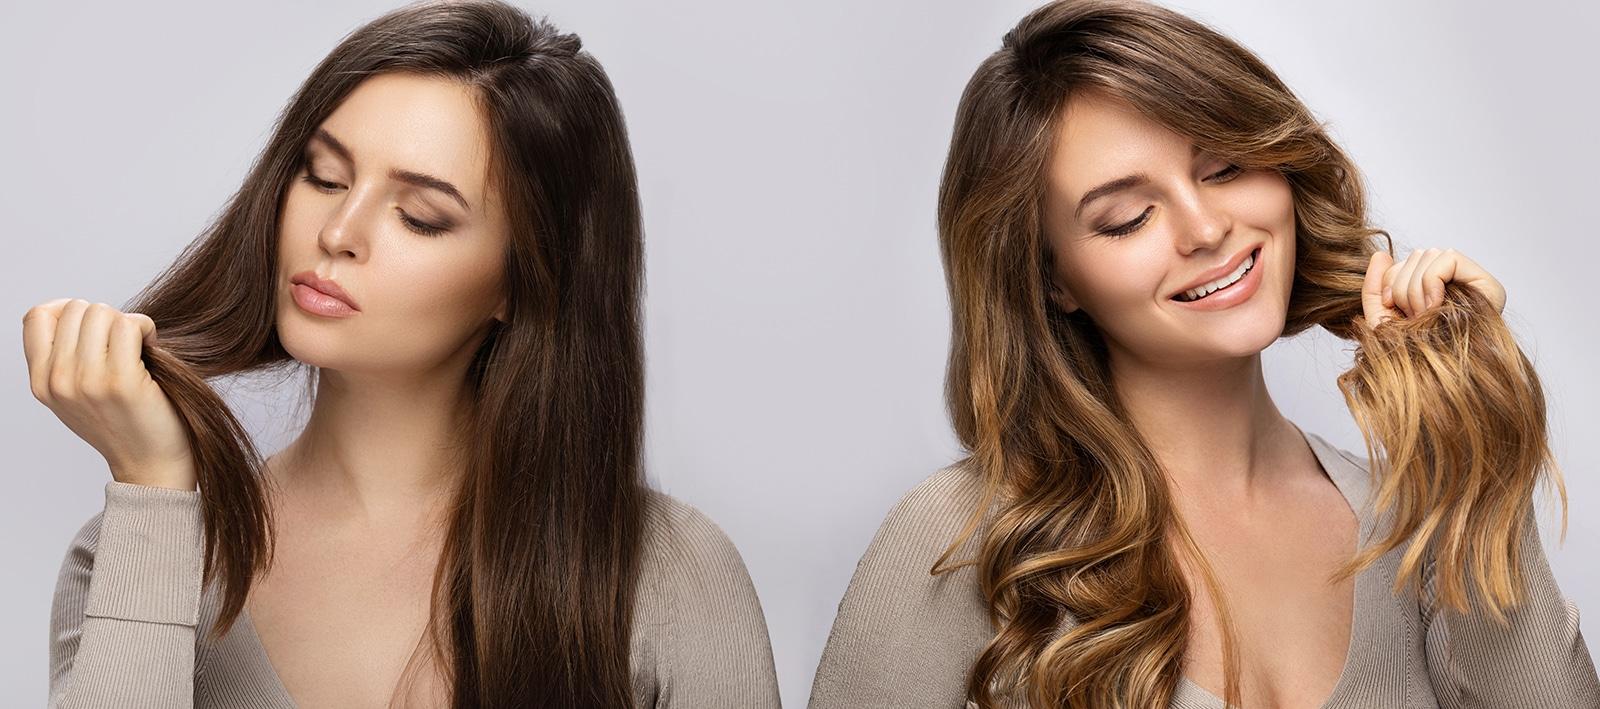 Do you want a natural looking hair color? Shatush may be a good option